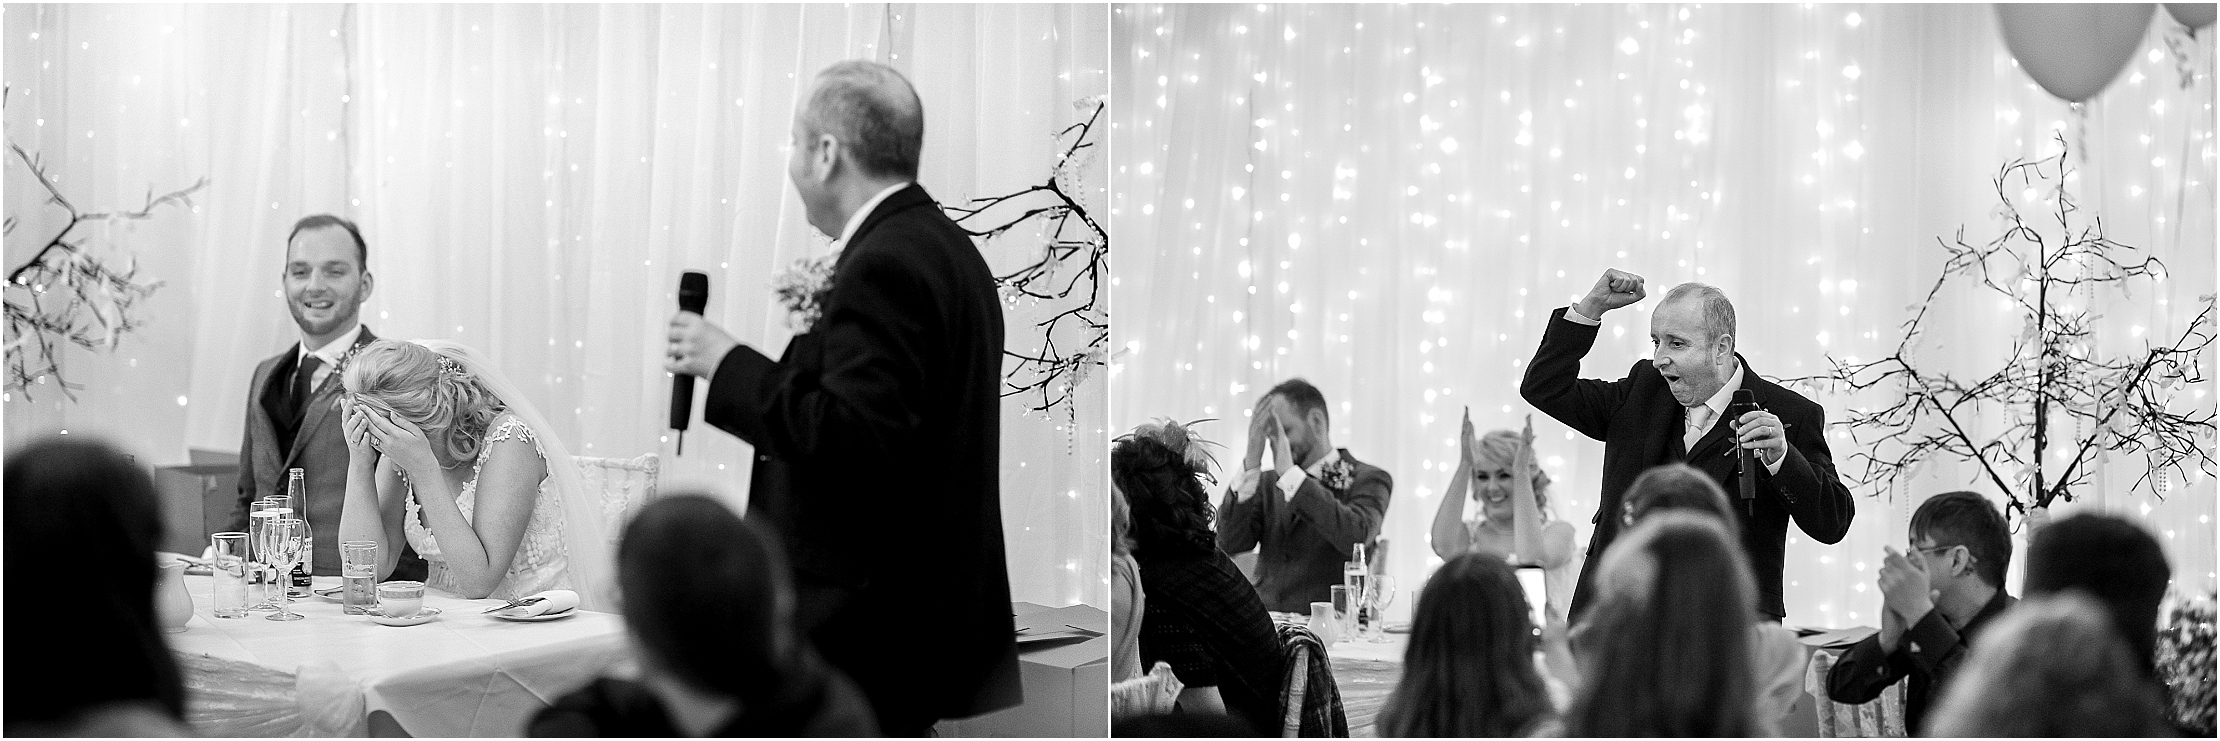 farington-lodge-wedding-58.jpg